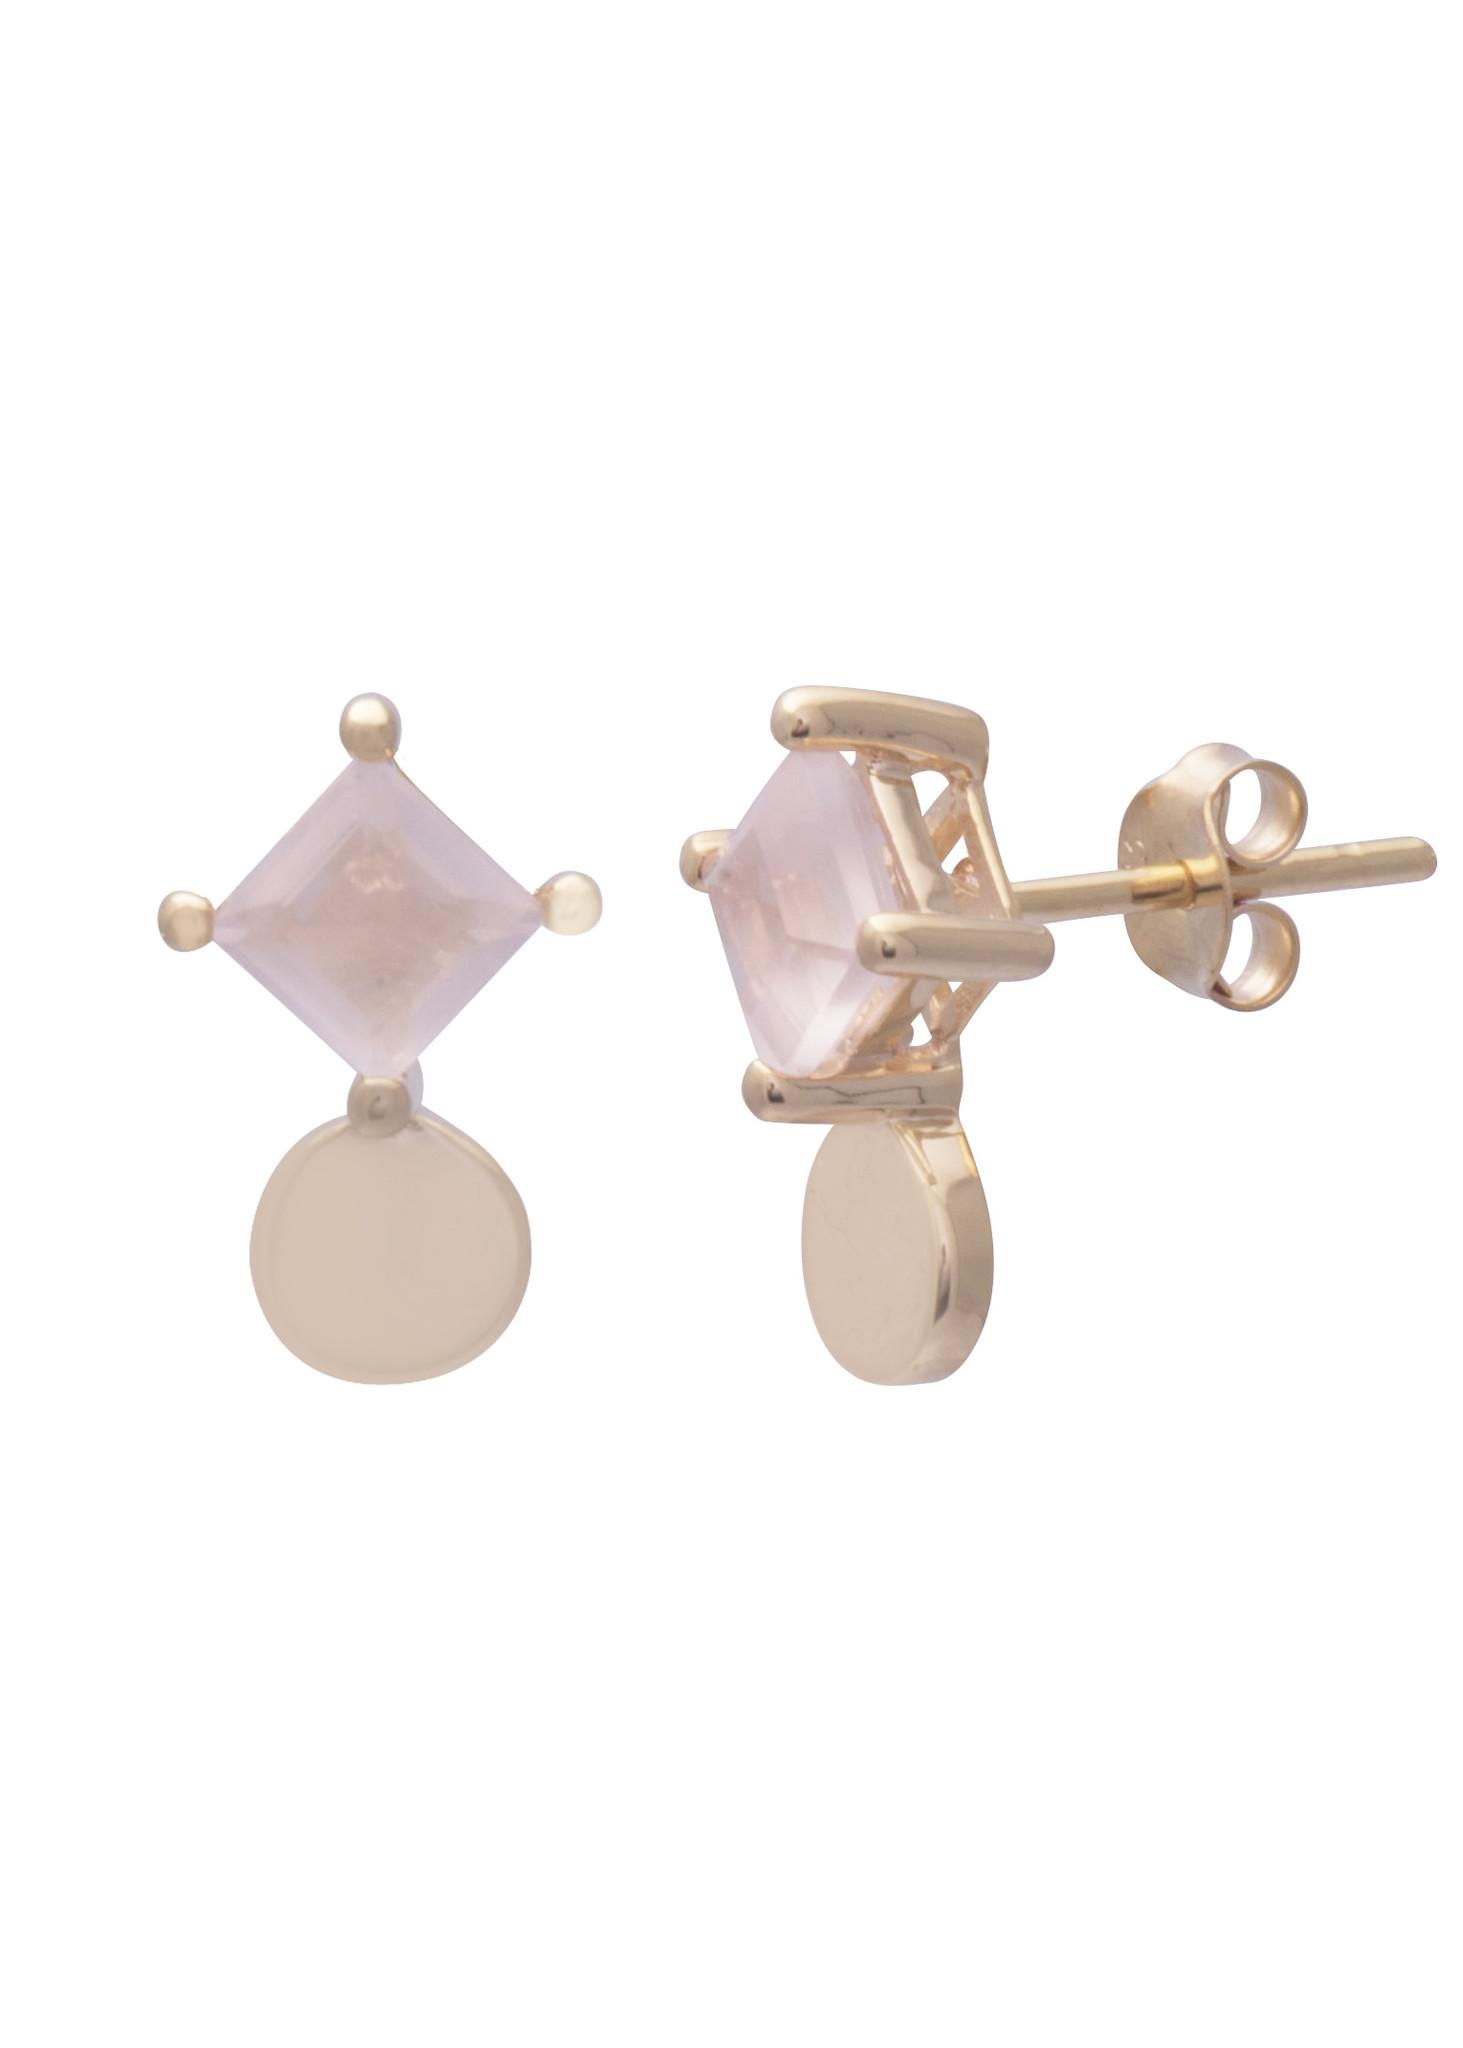 Sarah Mulder Jewelry Boucles d'oreilles Sorn